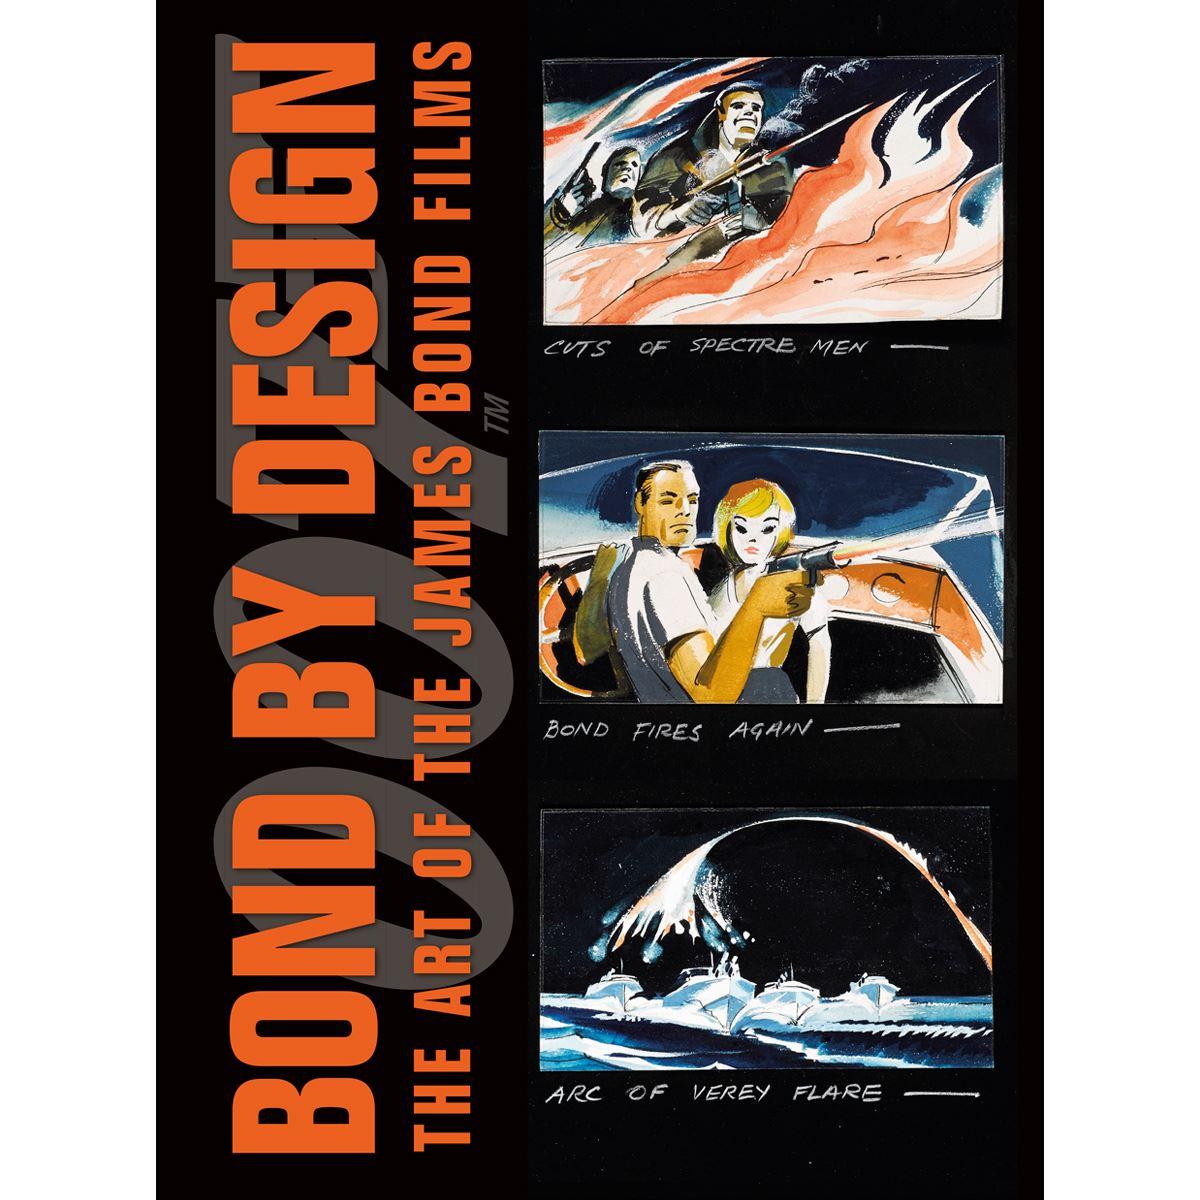 Bond by Design: The Art of the James Bond Films